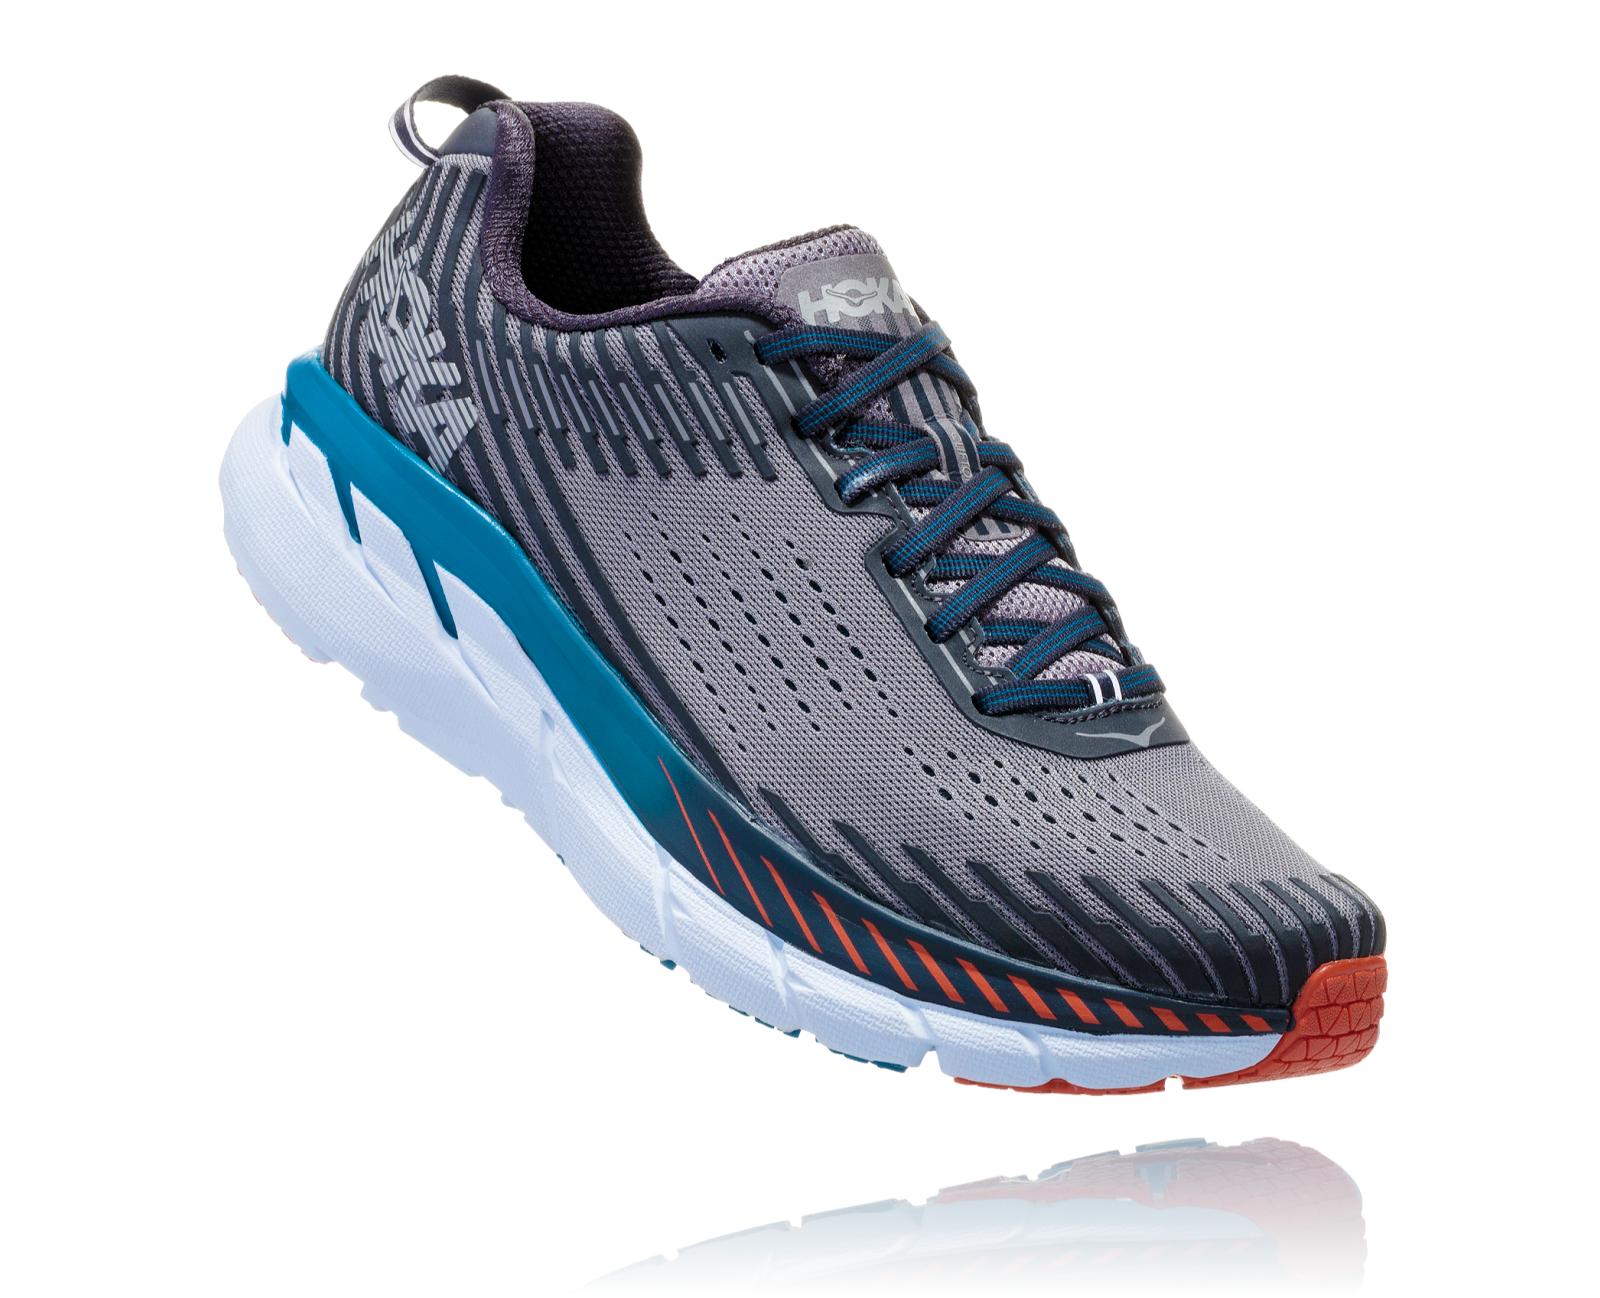 Men's Clifton 5 WIDE - Hoka One One Athletic Shoes-Hoka One One